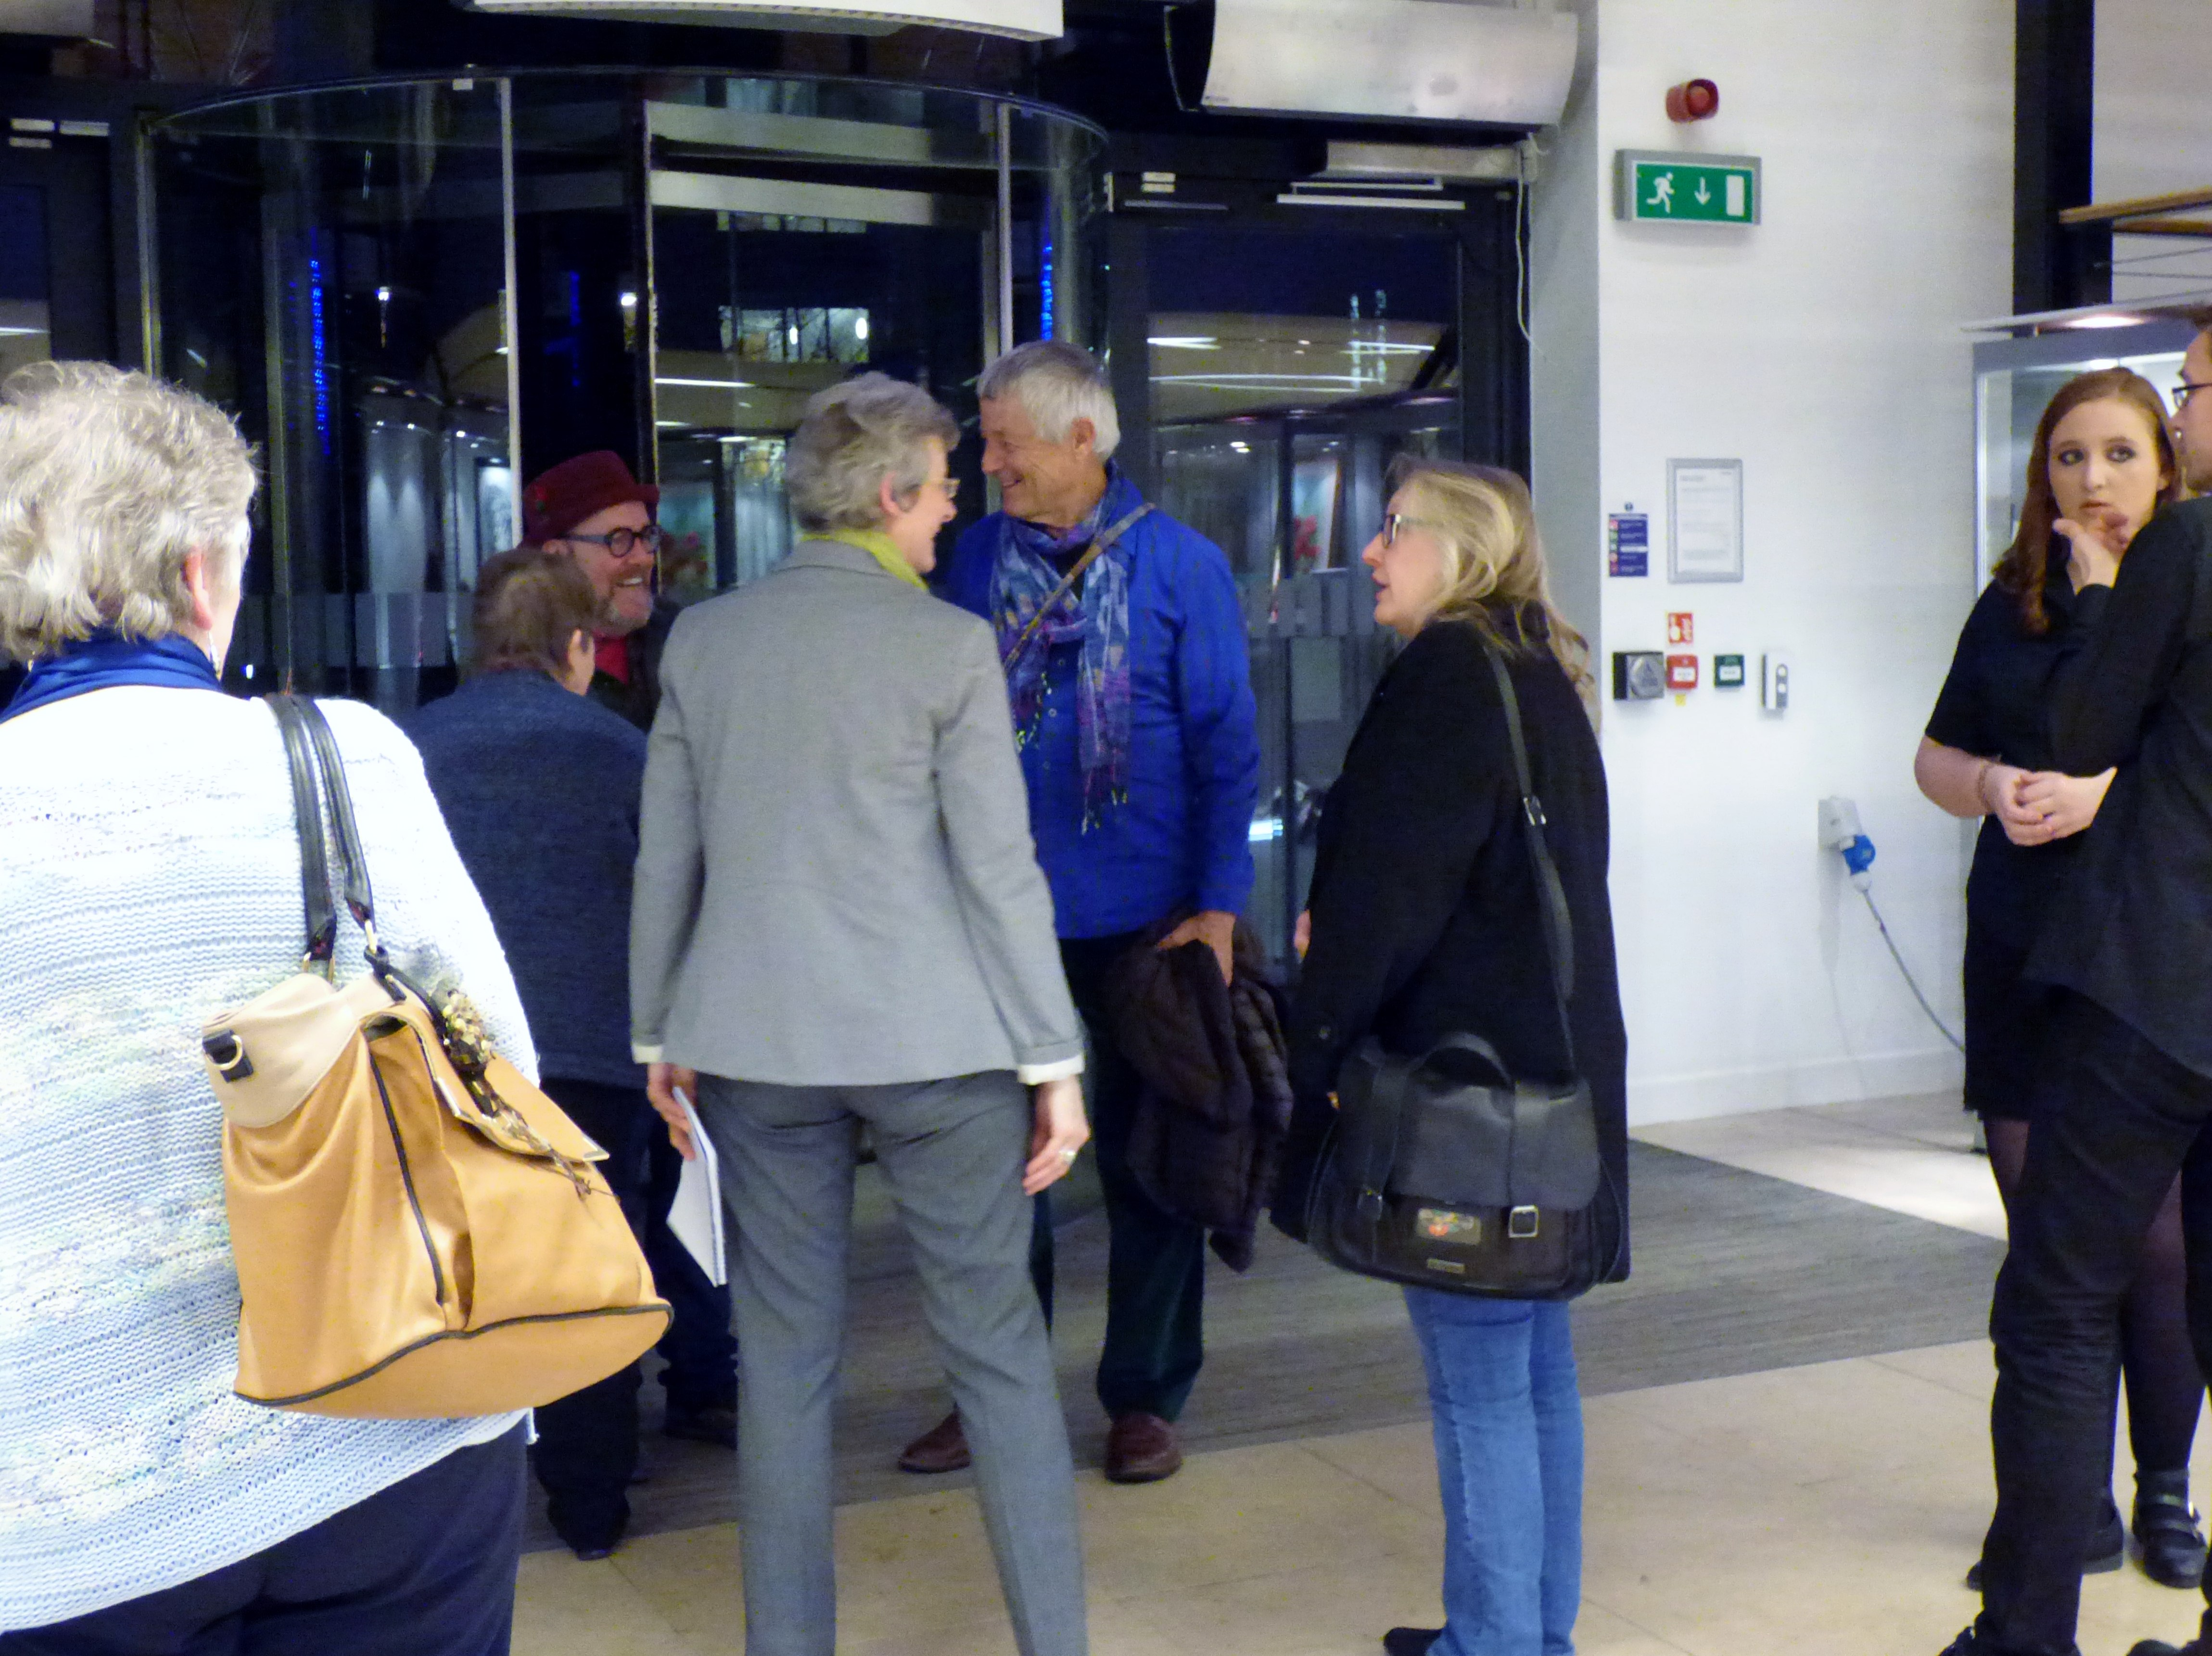 our first glimpse of Kaffe Fassett at Kaffe Fassett Lecture, Capstone Theatre, Dec 2016